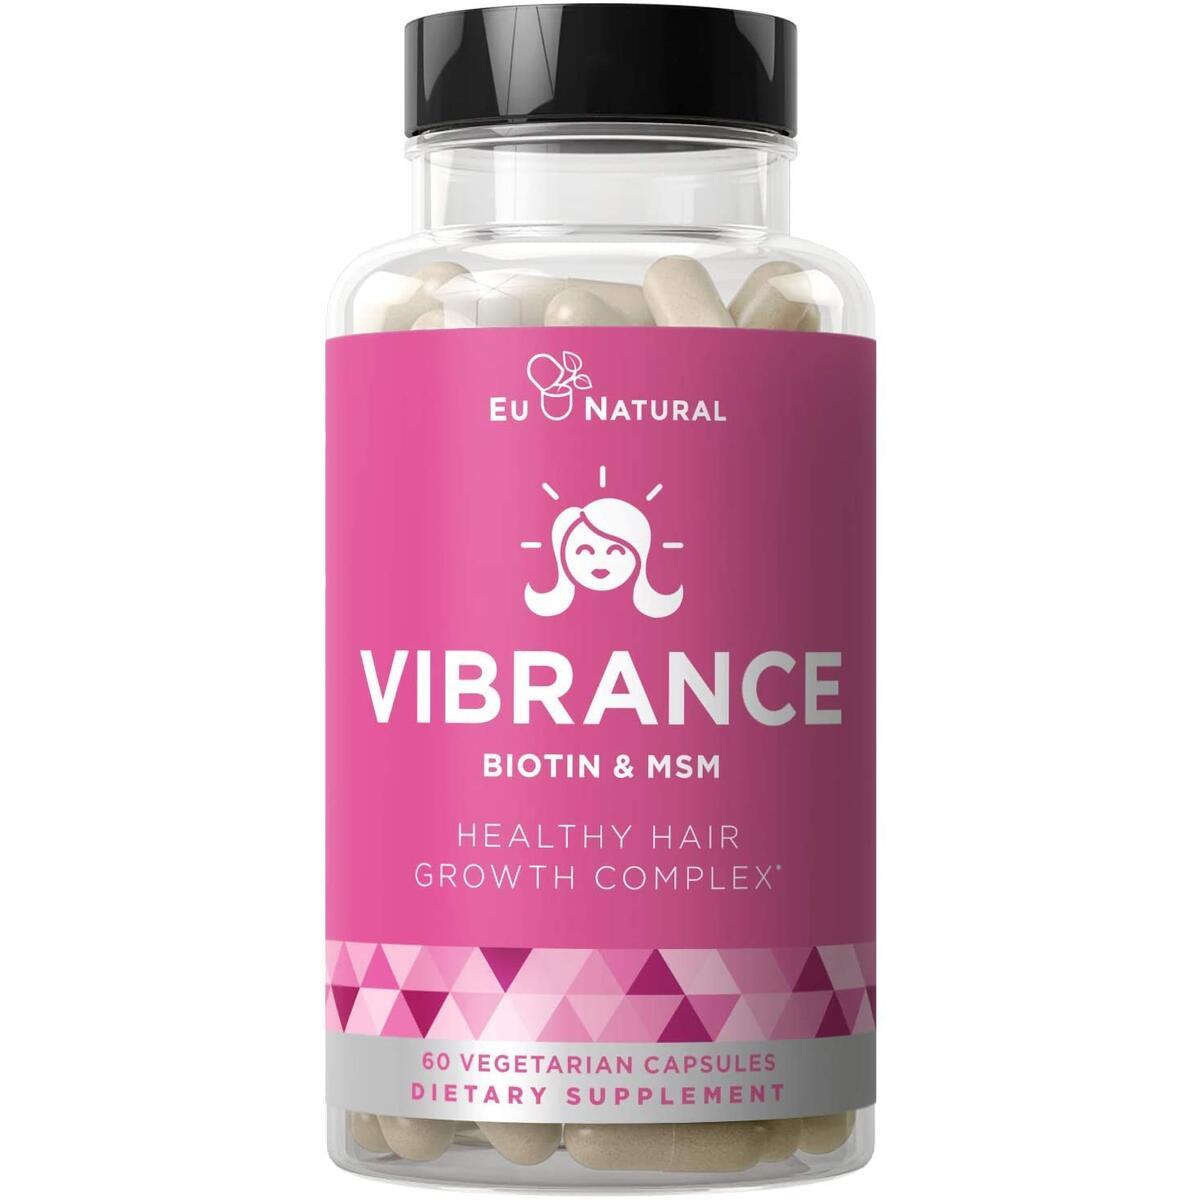 VIBRANCE Hair Growth Vitamins with Biotin – Grow Hair Faster, Healthier & Stronger Length, Beautiful Locks for All Hair Types